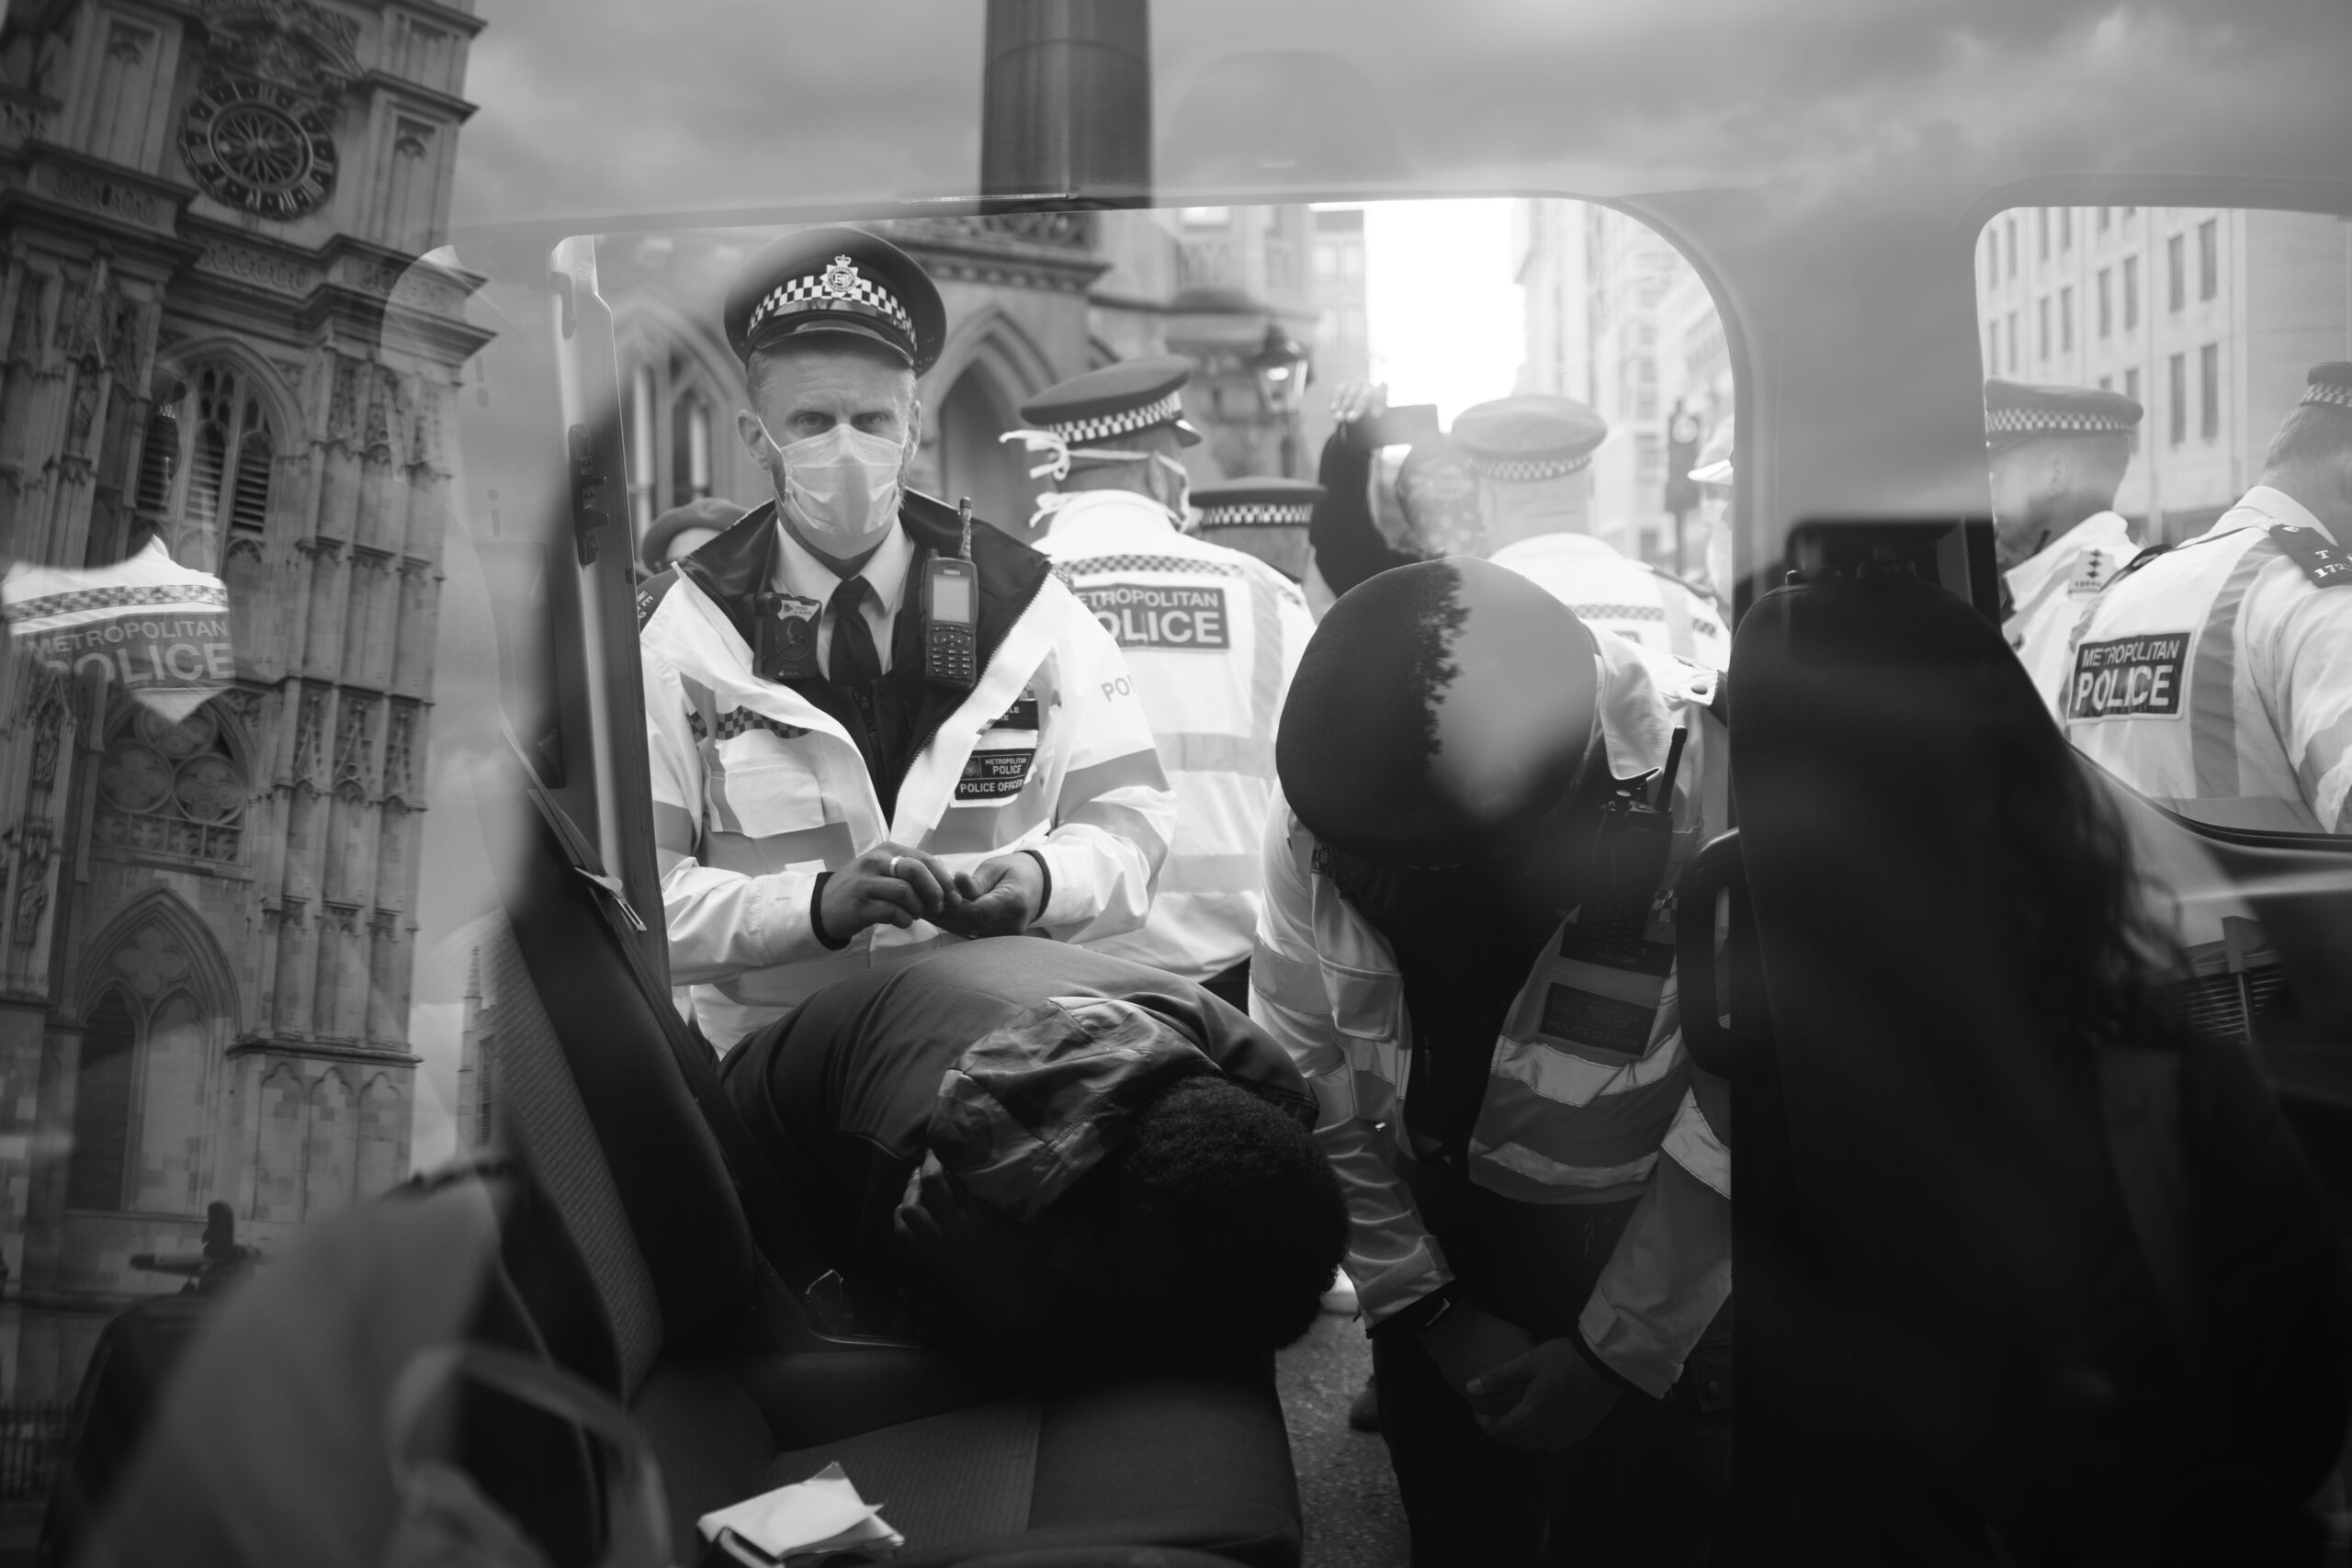 Police arrest a black Man, London, Extinction Rebellion